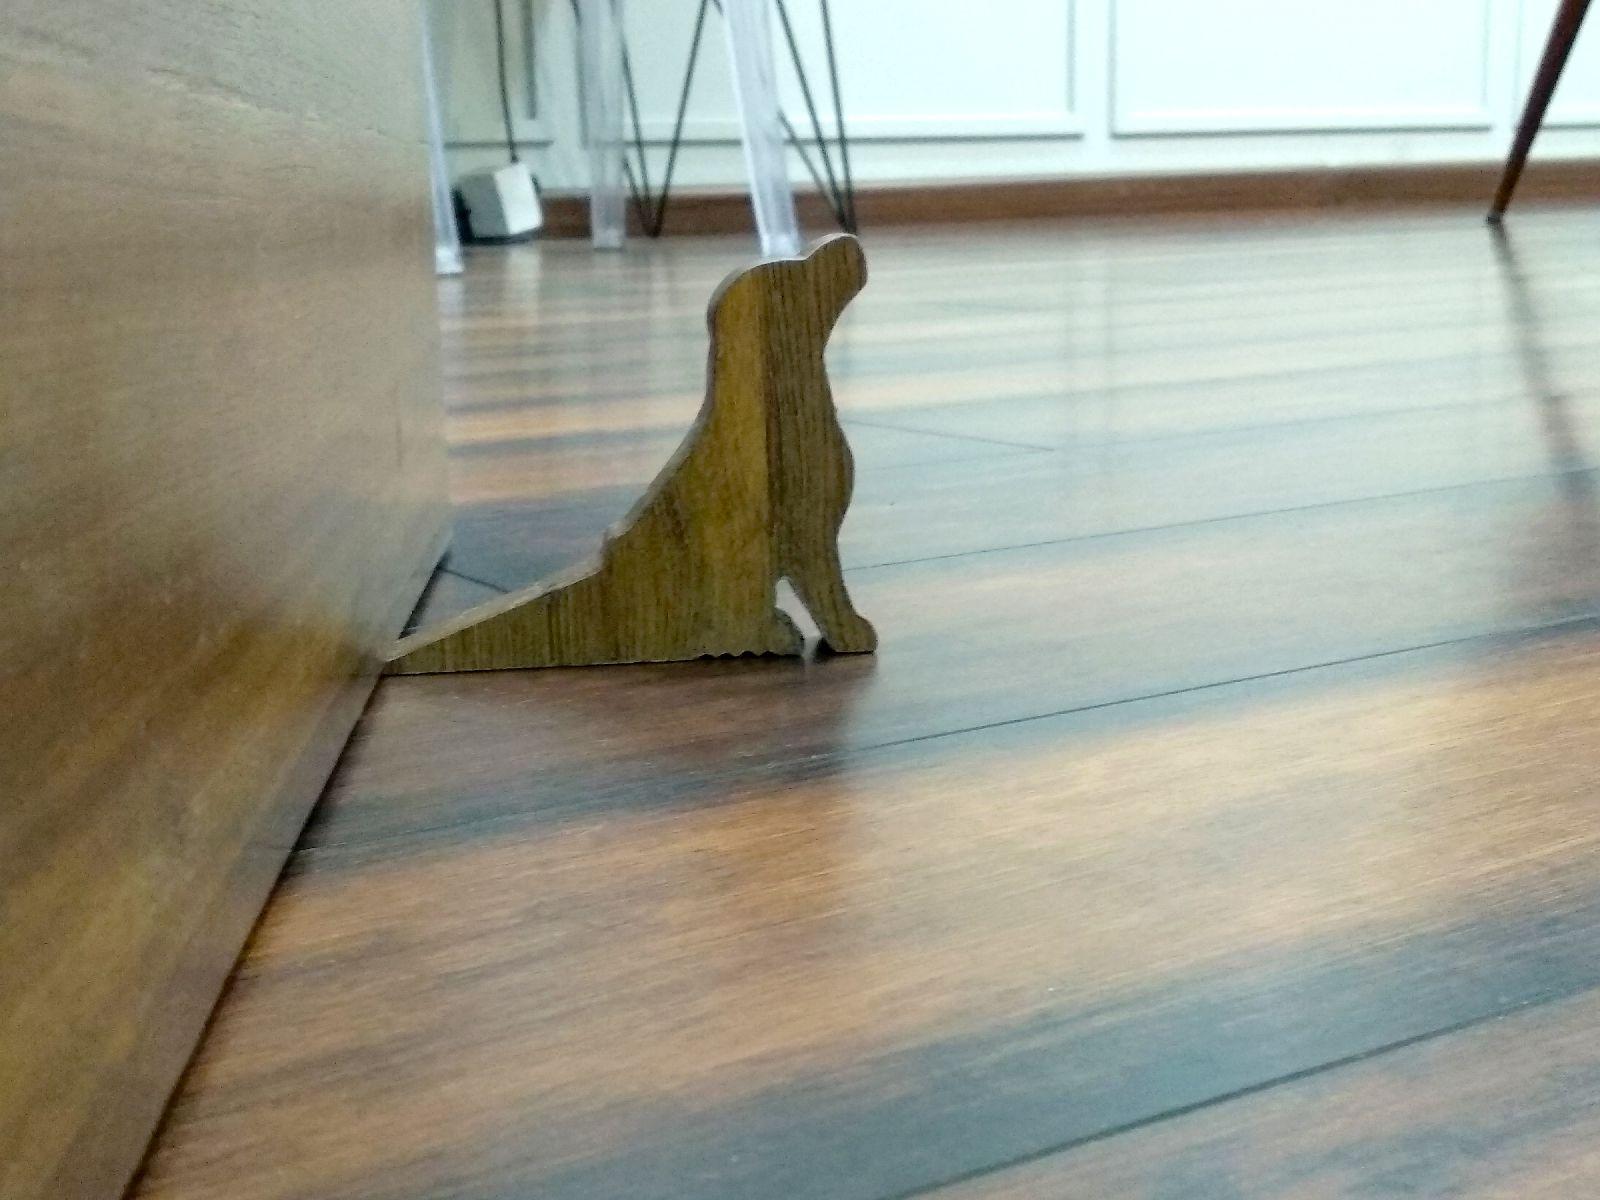 Buy Jaamsoroyals Dog Design Small Non Slip Wooden Door Stoppers To